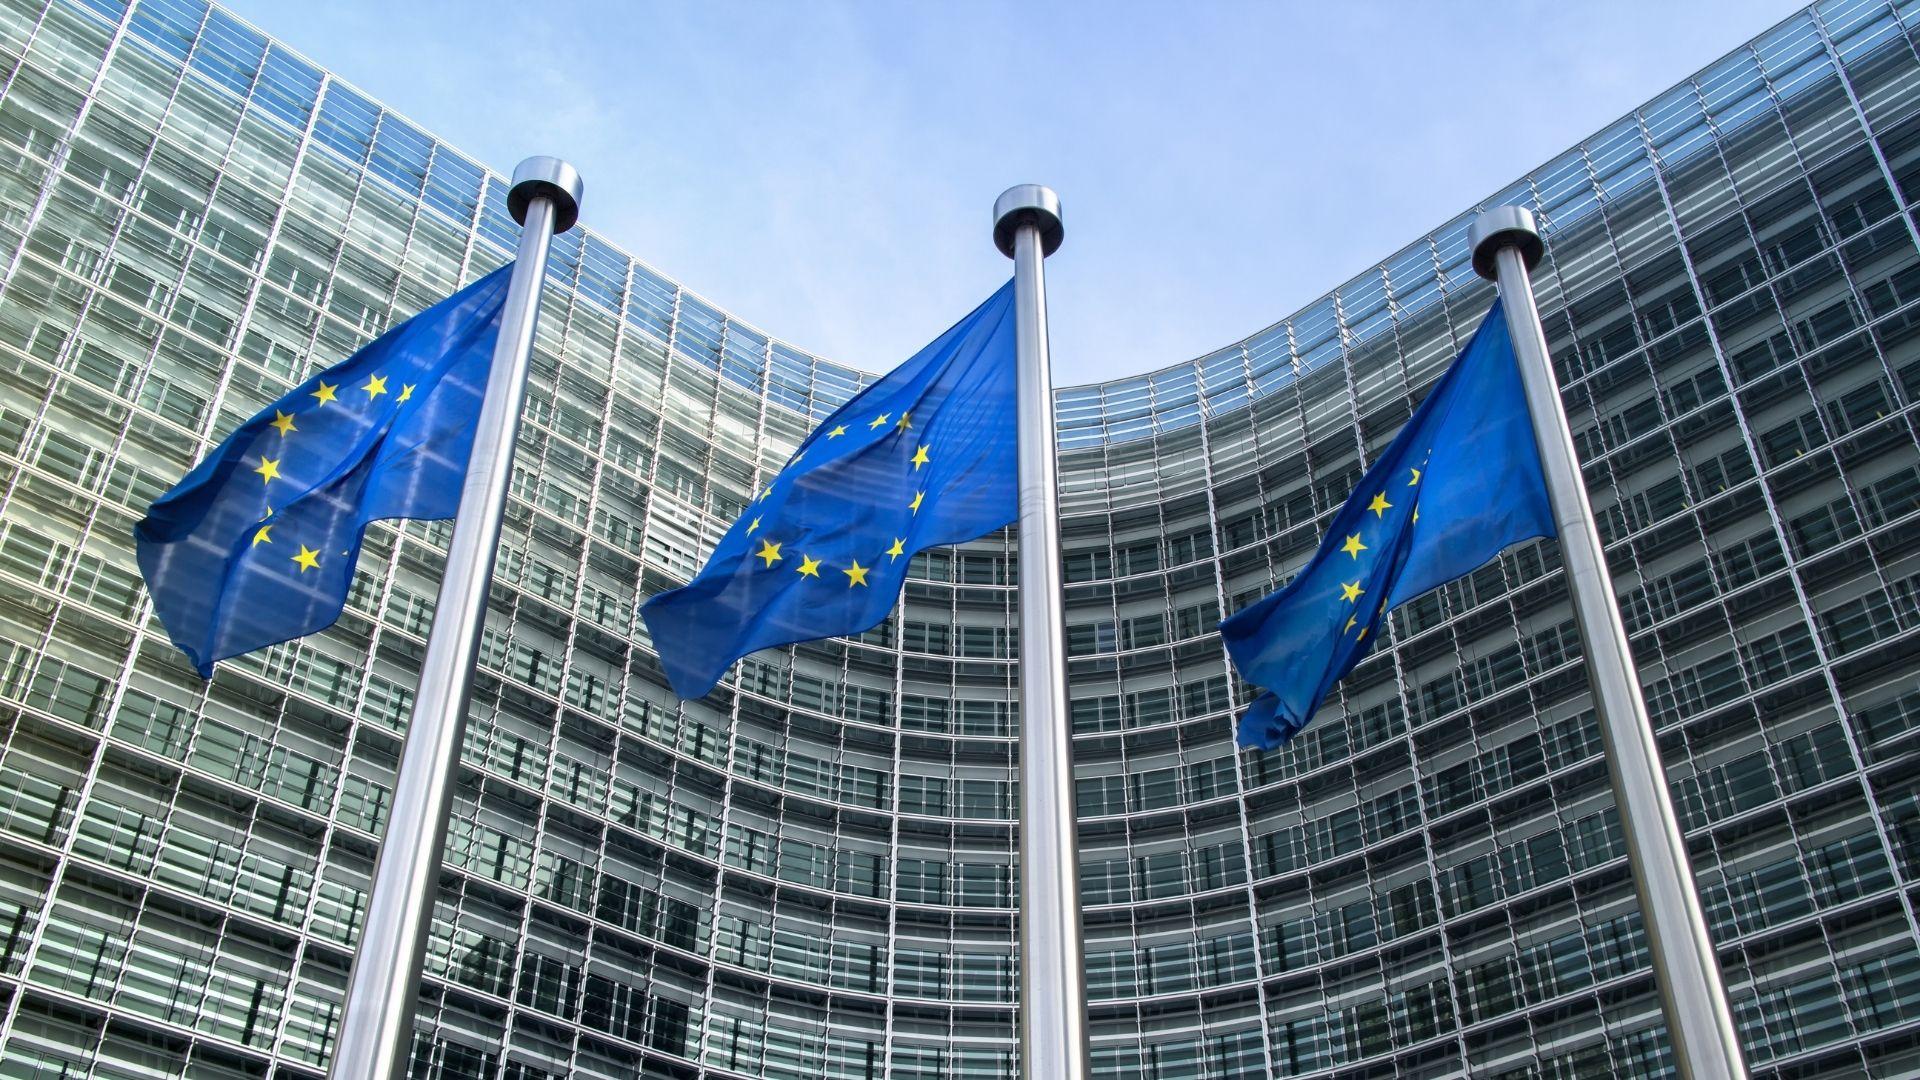 Read more about the article Δίκαιο και Πολιτική στην Ευρωπαϊκή Ένωση (MA, 1.5 Έτος ή 3 Eξάμηνα) – Εξ Αποστάσεως (στην Ελληνική)